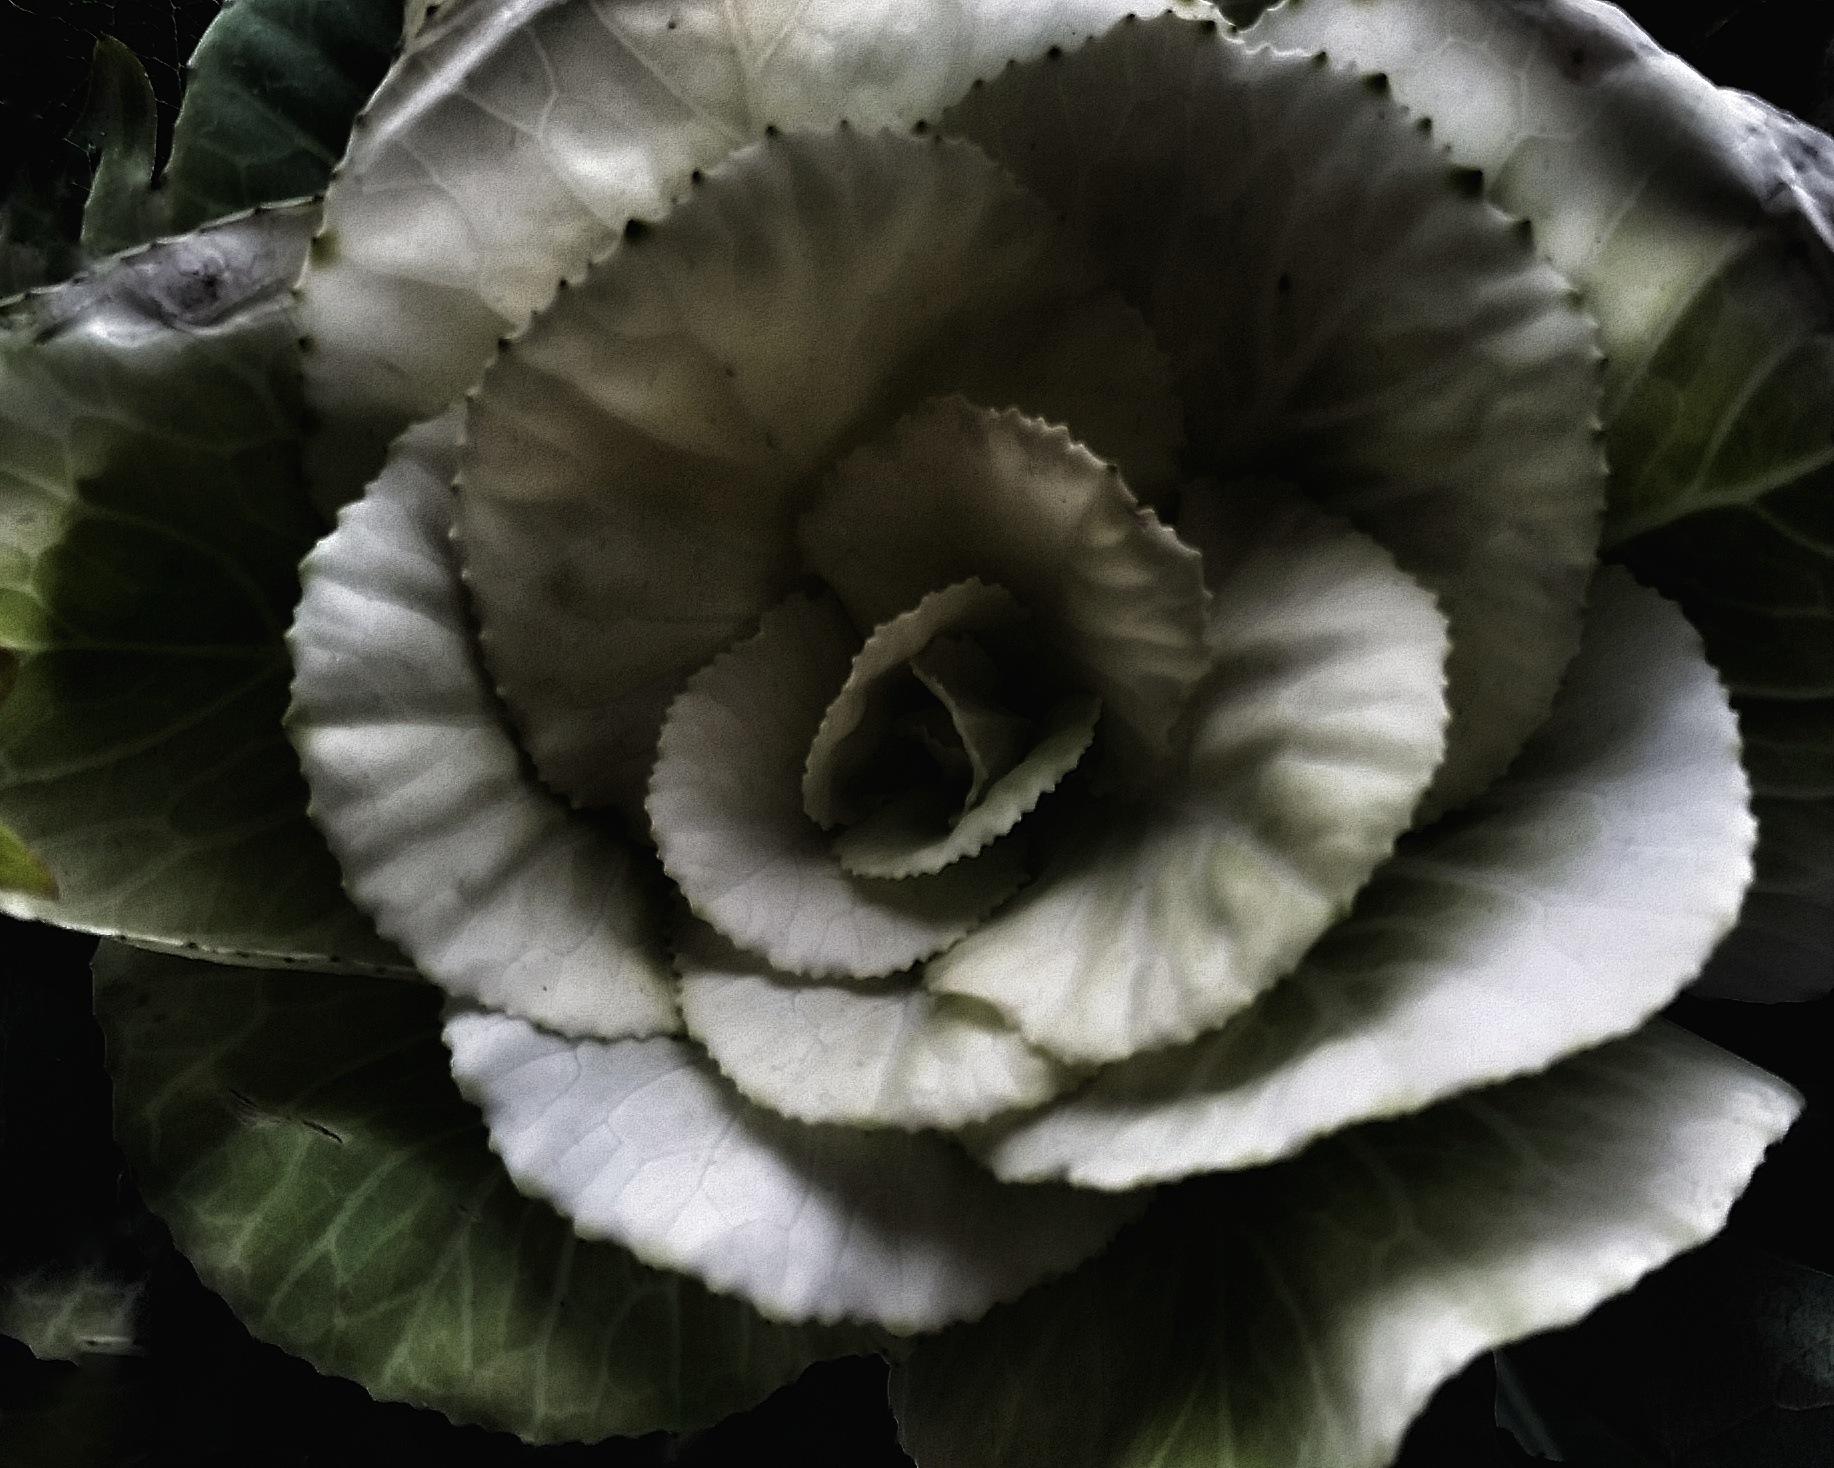 Weird Rose by Minimeme Photo Art